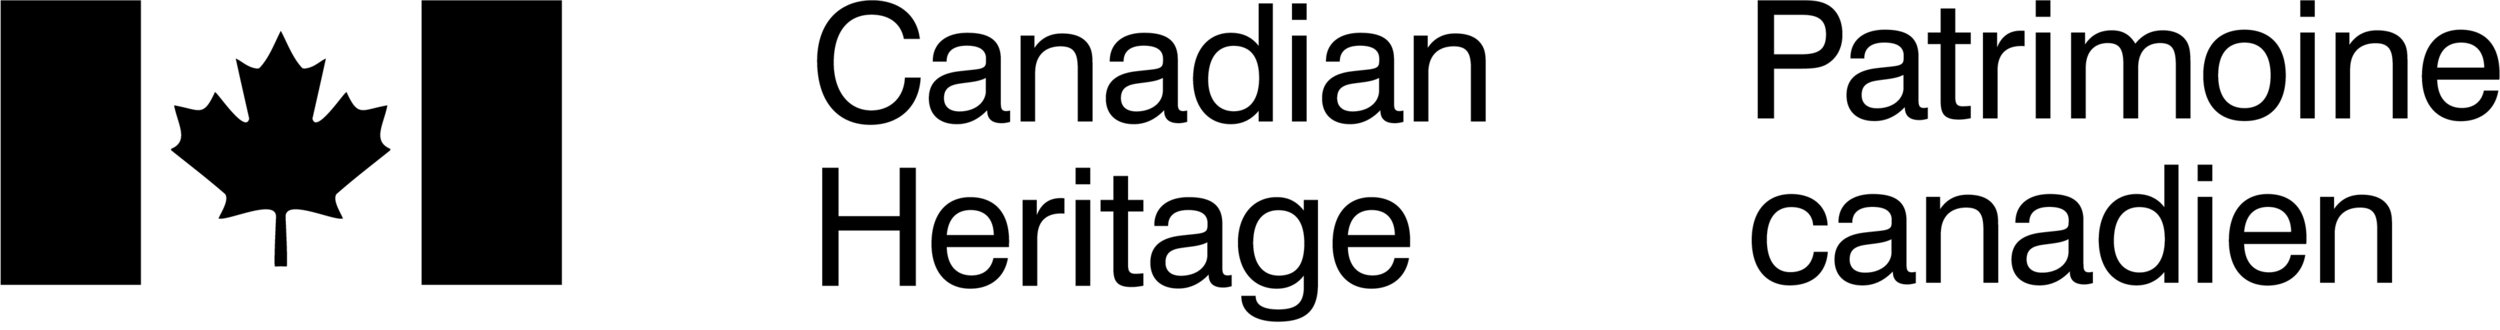 canadianheritage-bwnew.jpg